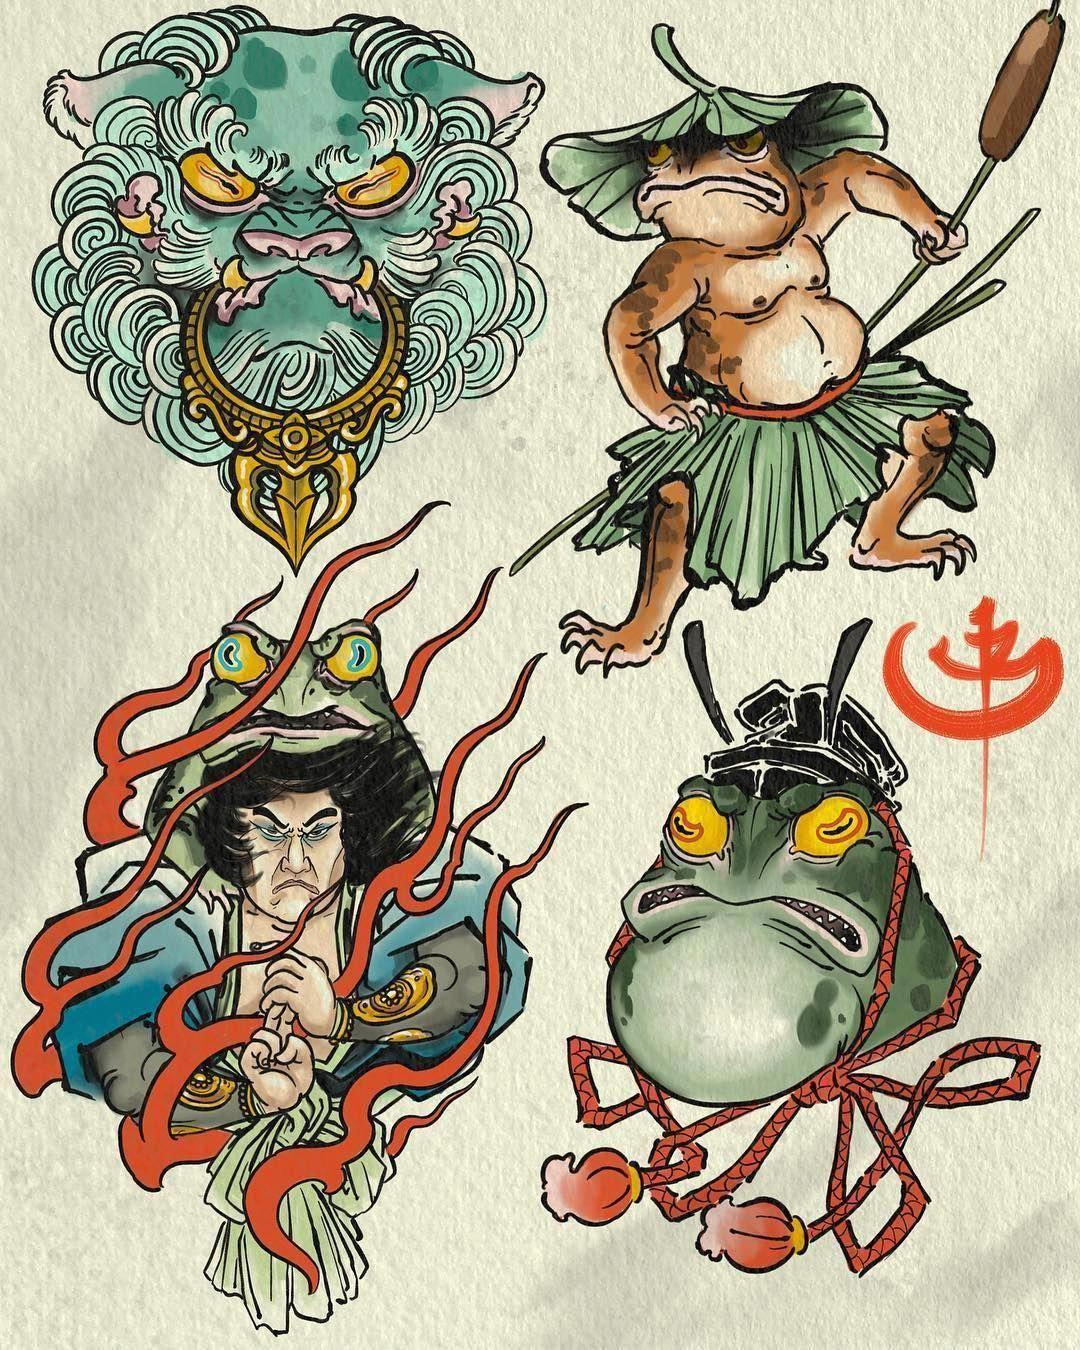 japanese tattoos for women Japanesetattoos Hình xăm